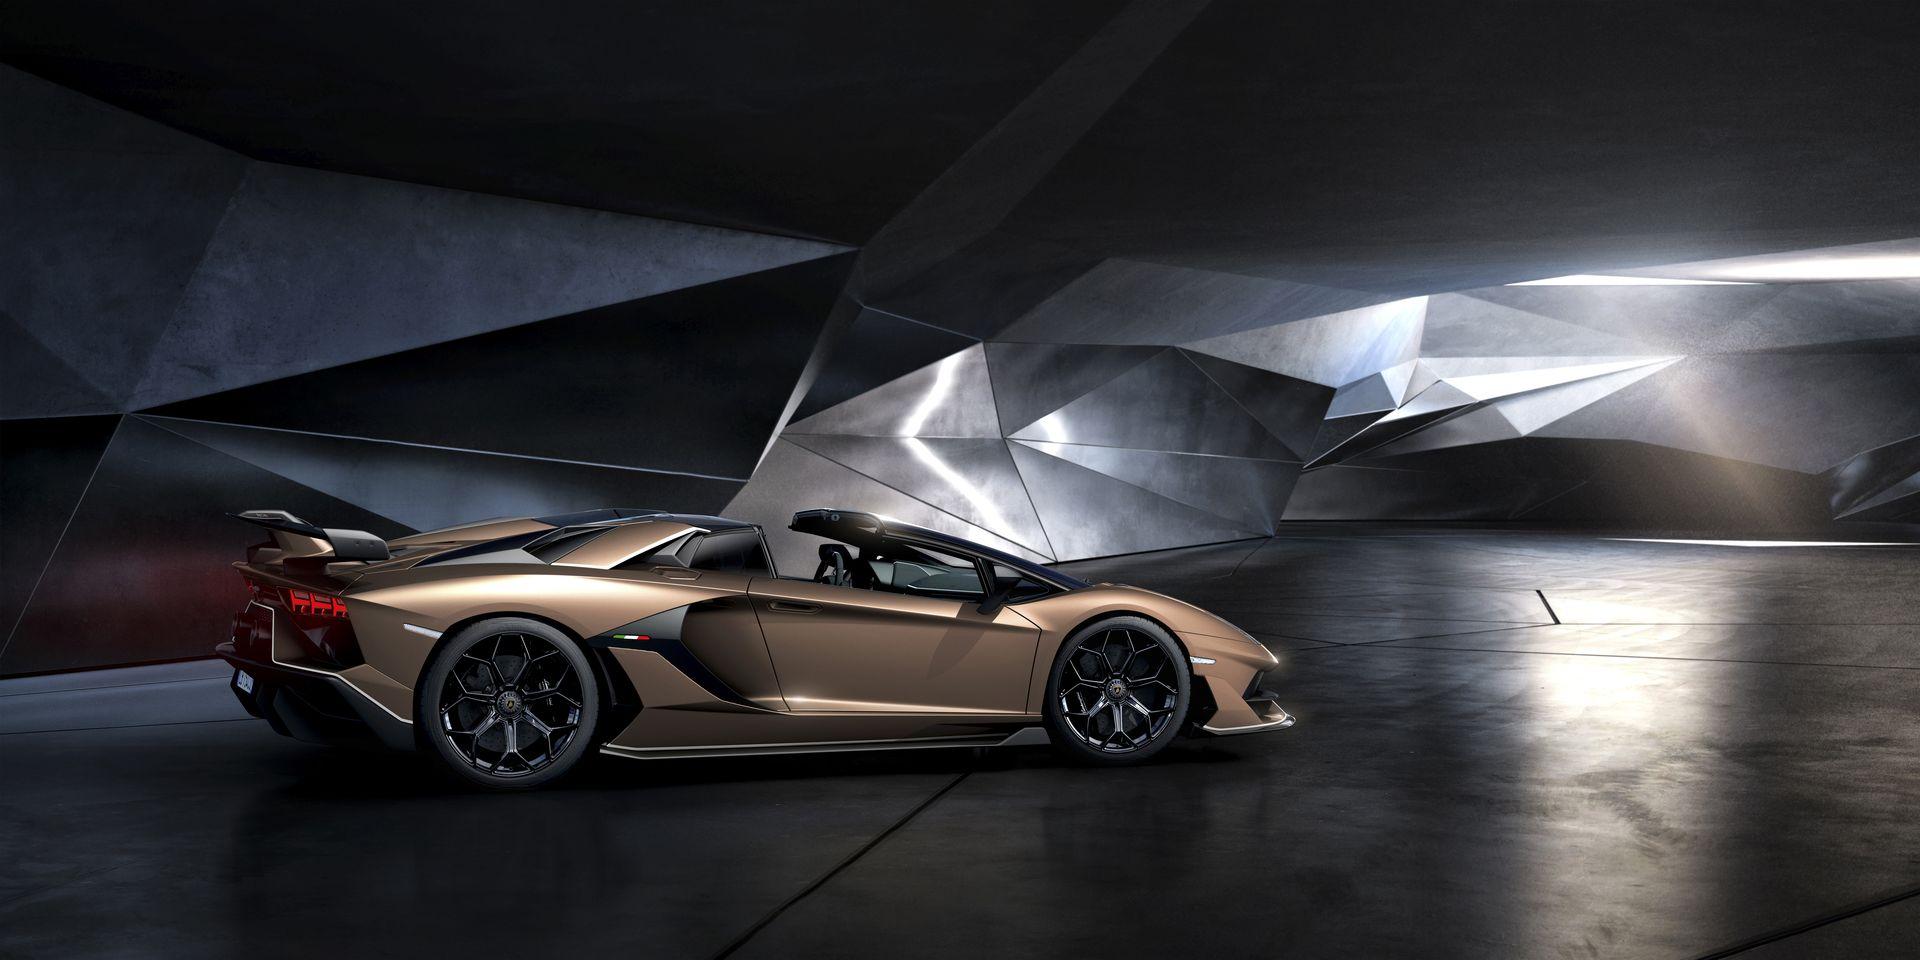 Lamborghini Aventador Svj Roadster 11